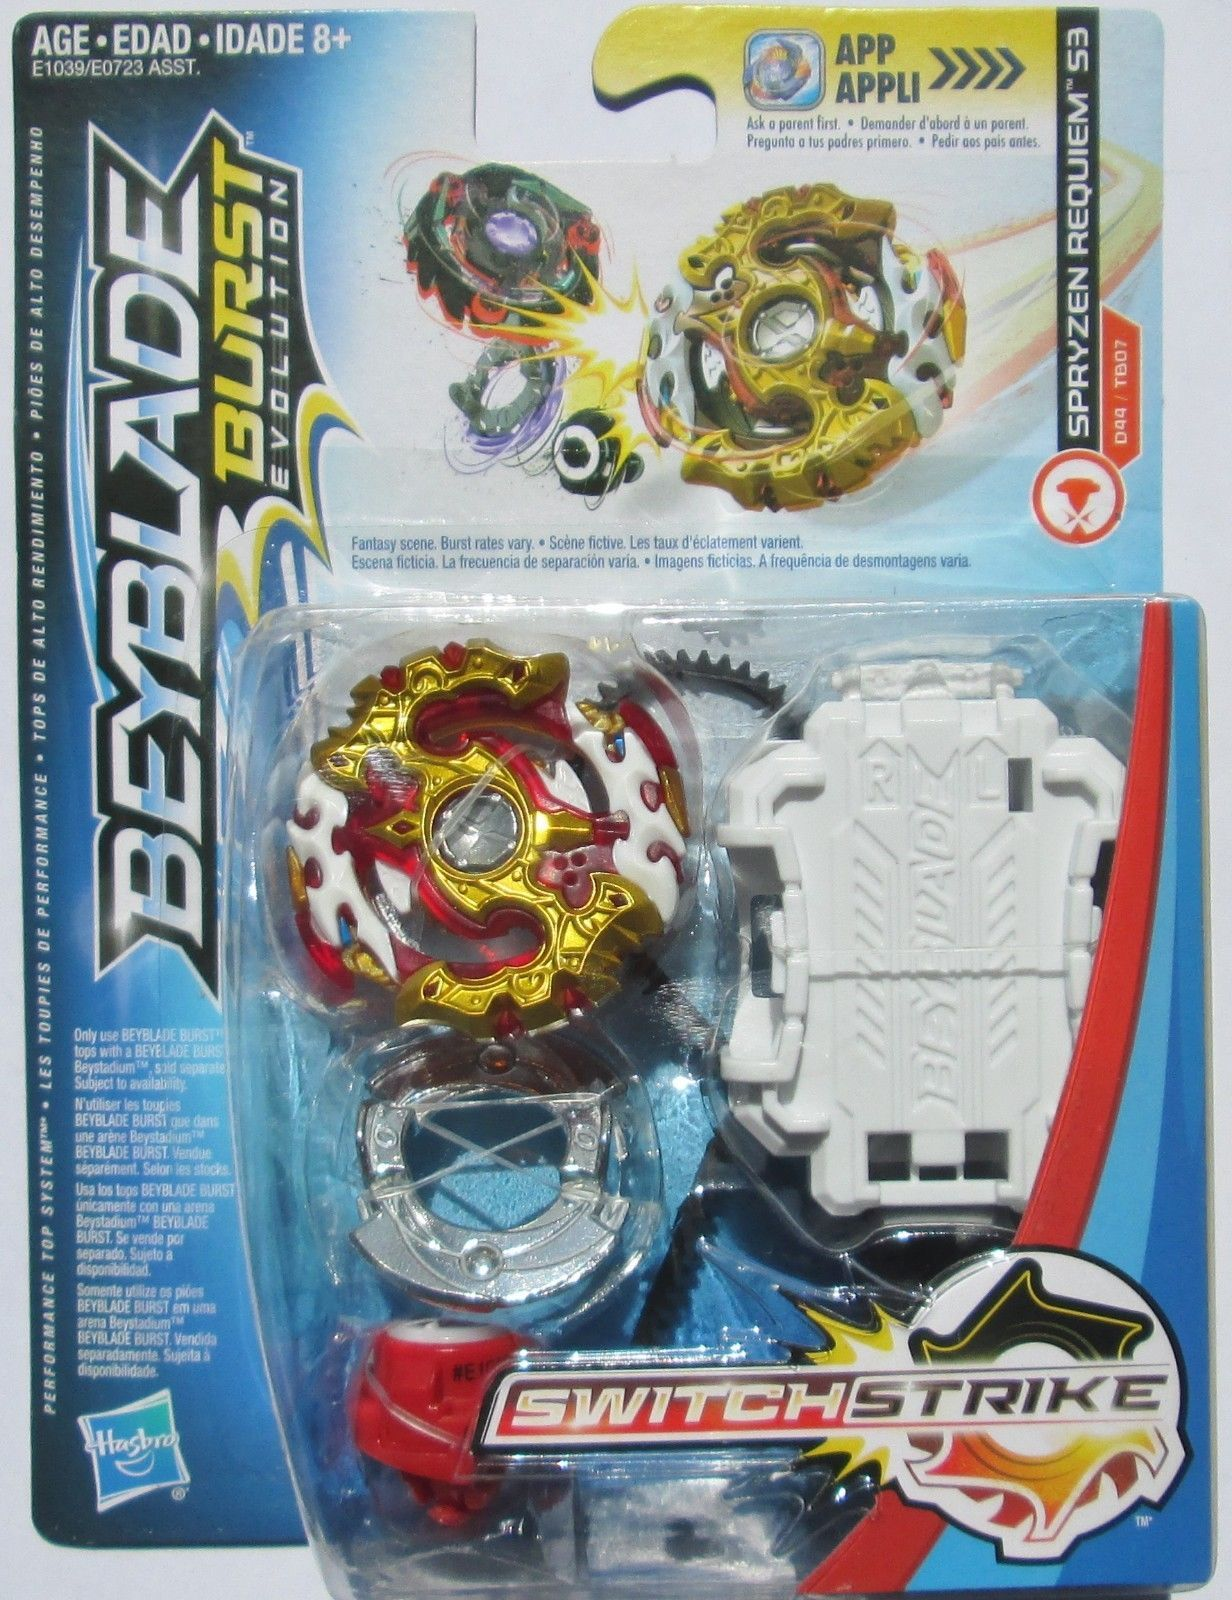 12PCS Beyblade Burst Set Spinning avec Grip Launcher Boîte de rangement portable